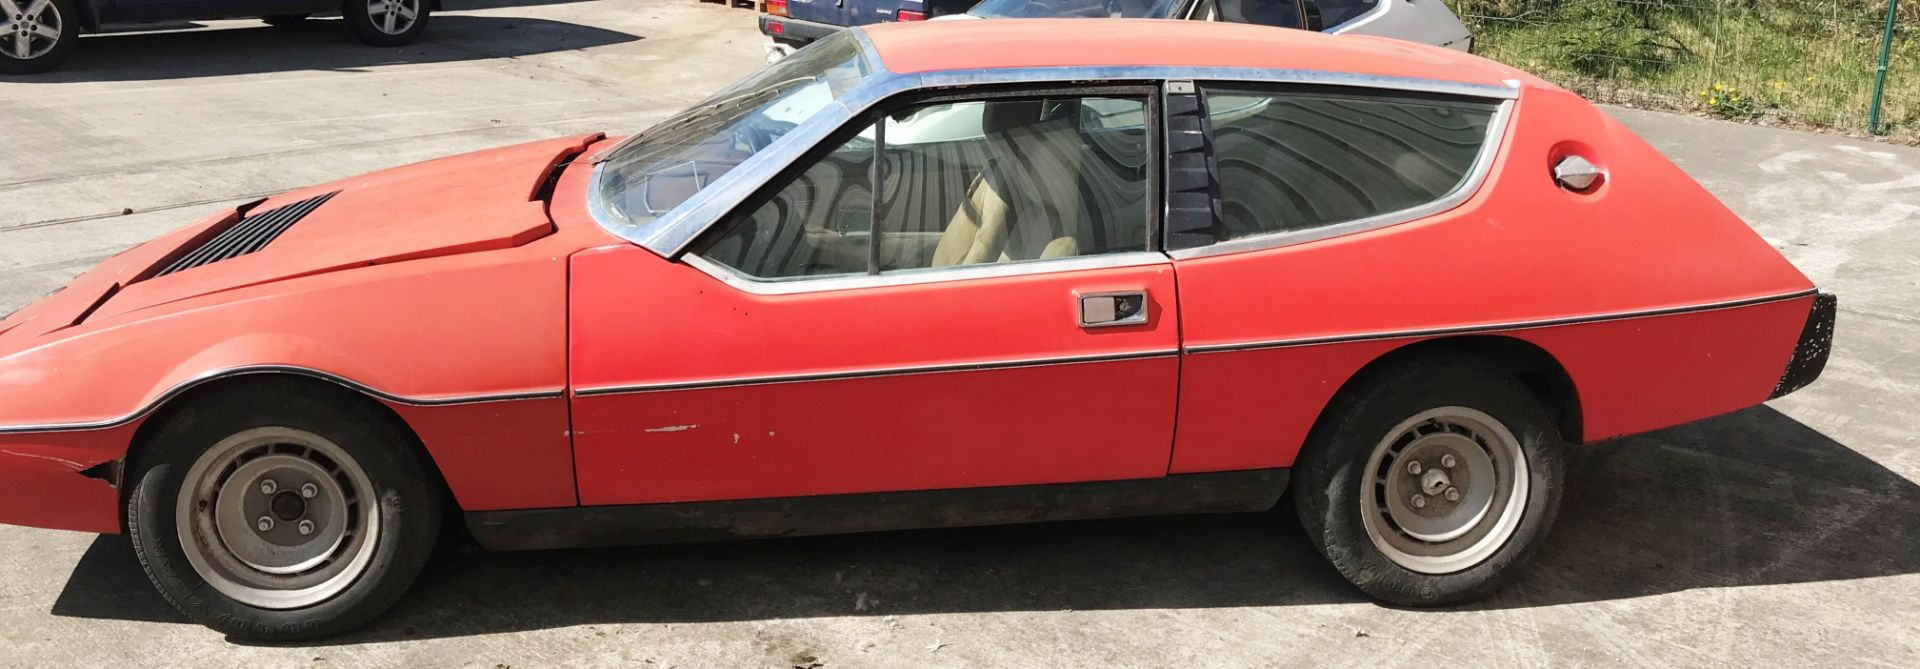 BARN FIND - IN NEED OF TOTAL RESTORATION LOTUS ELITE TWO DOOR SALOON (1973cc) - AUTOMATIC - petrol